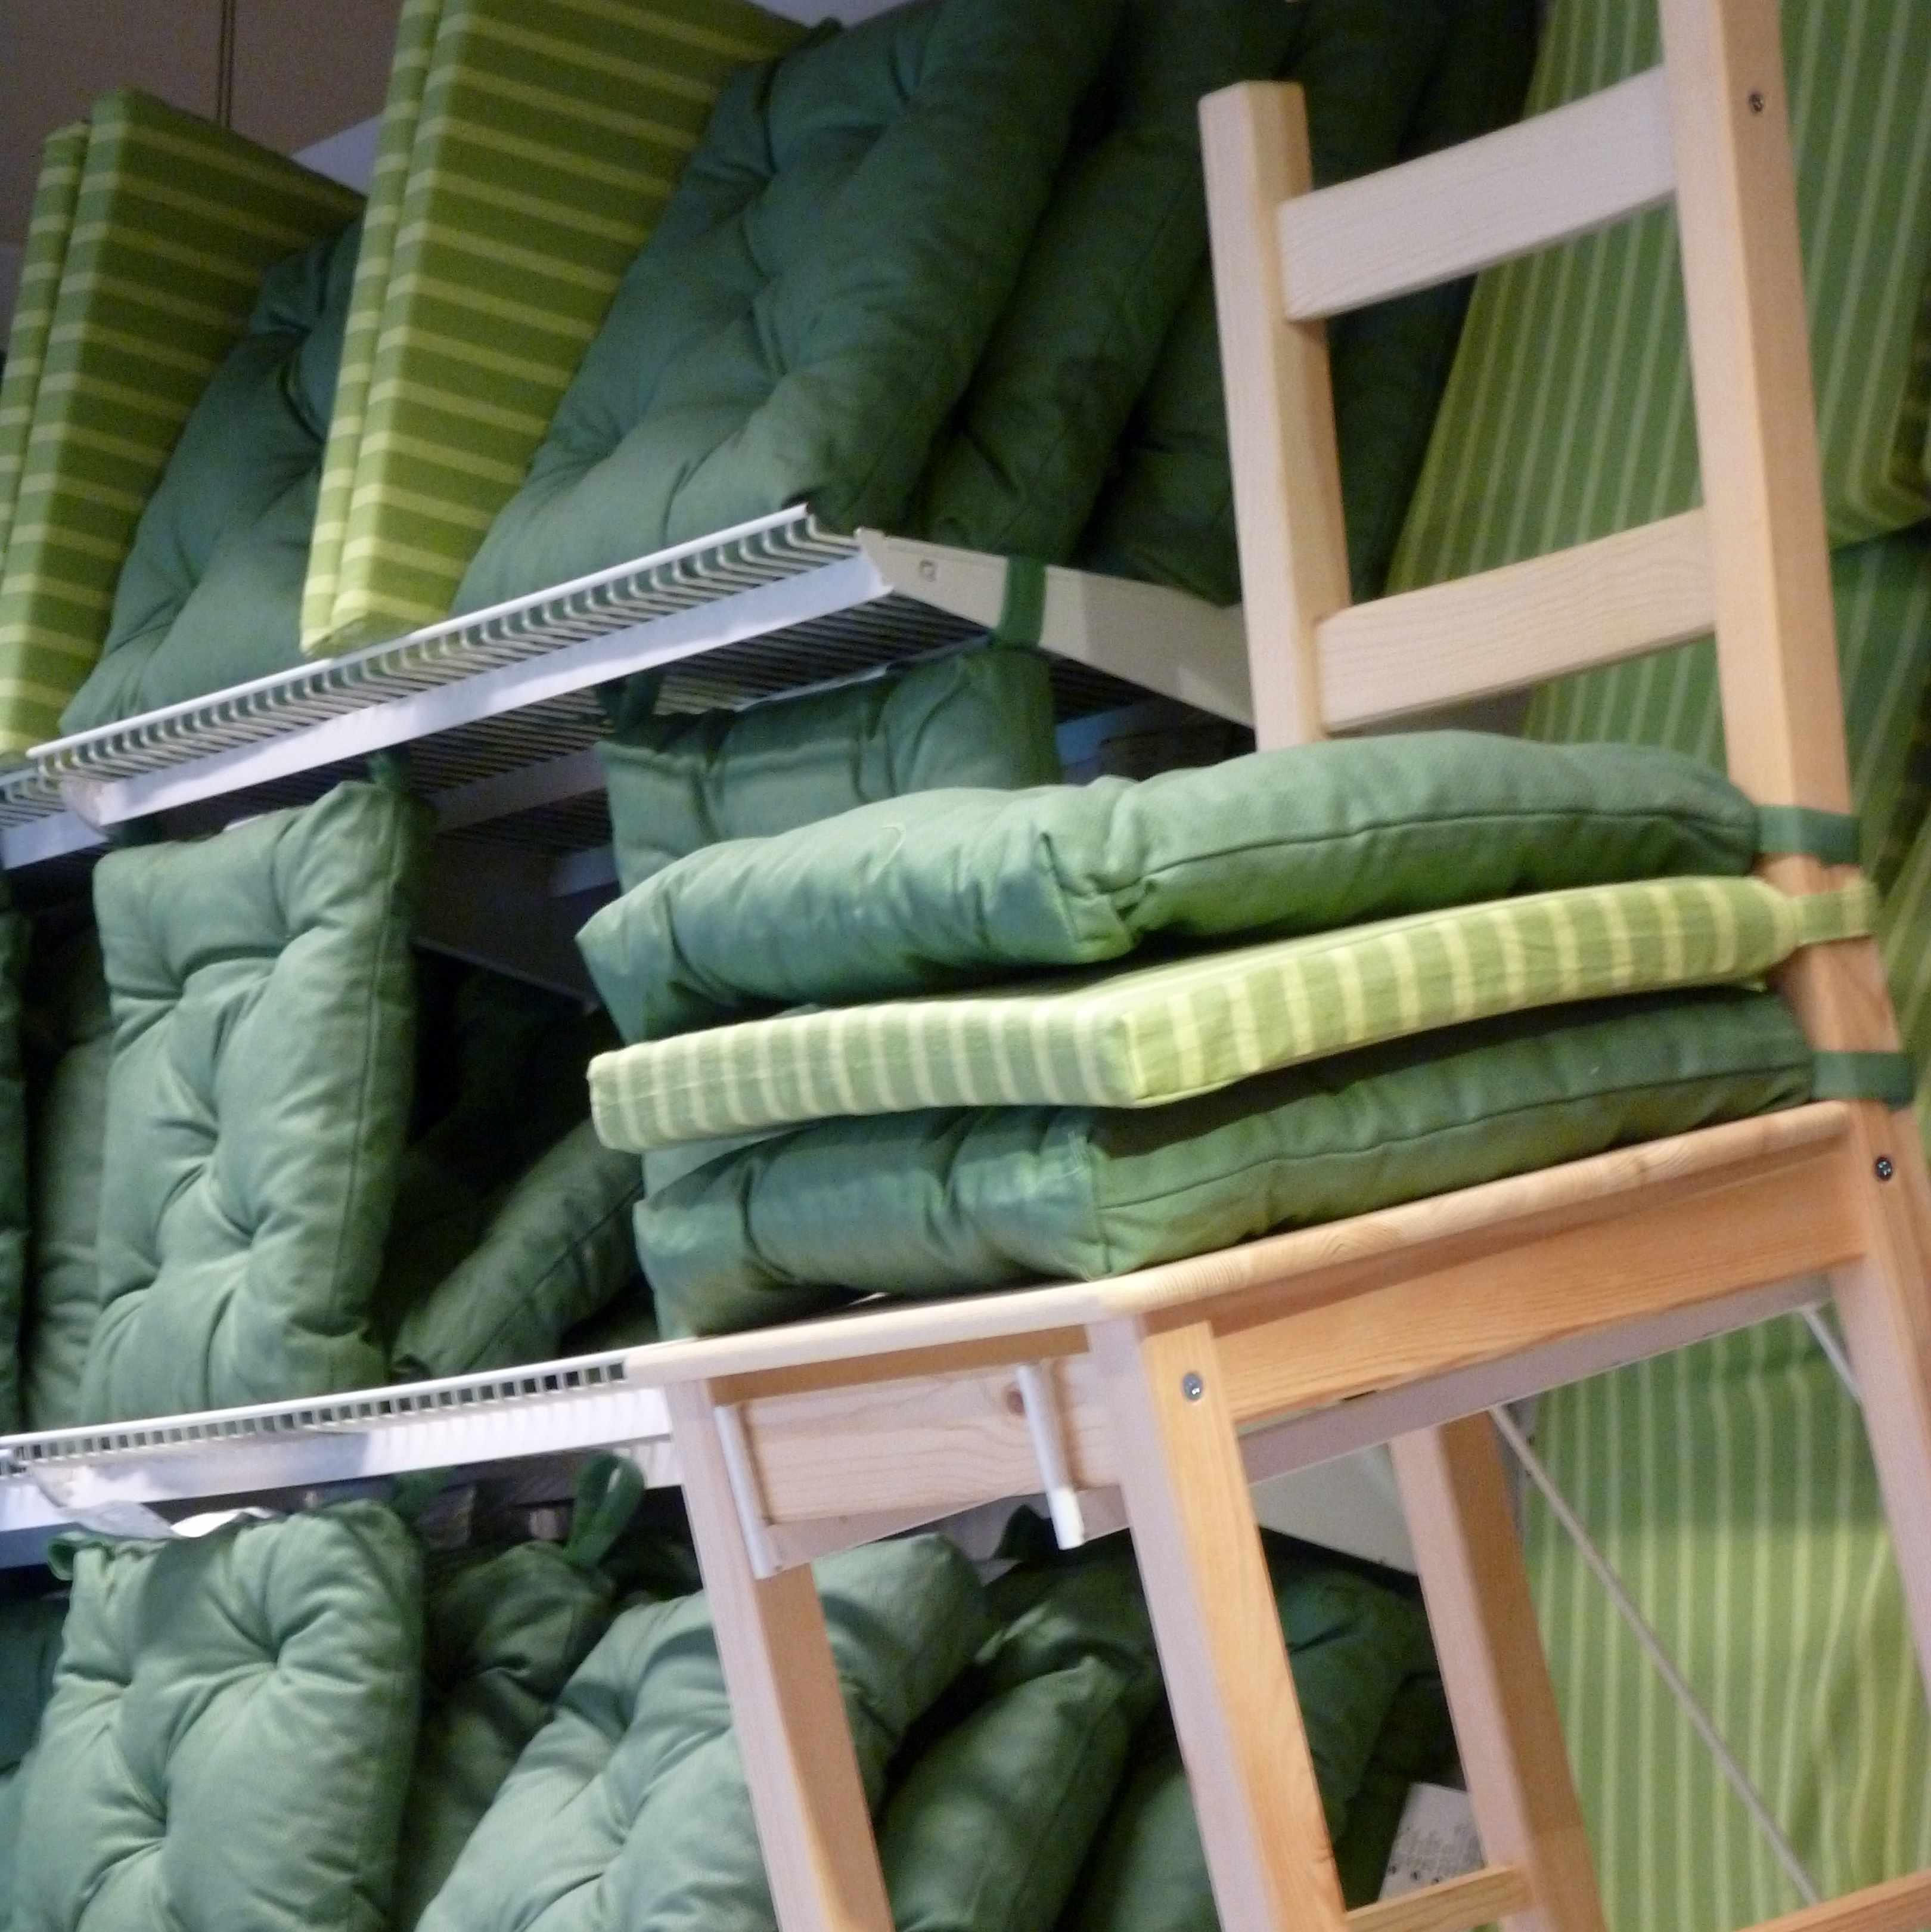 coussins verts Ikea 02-2014